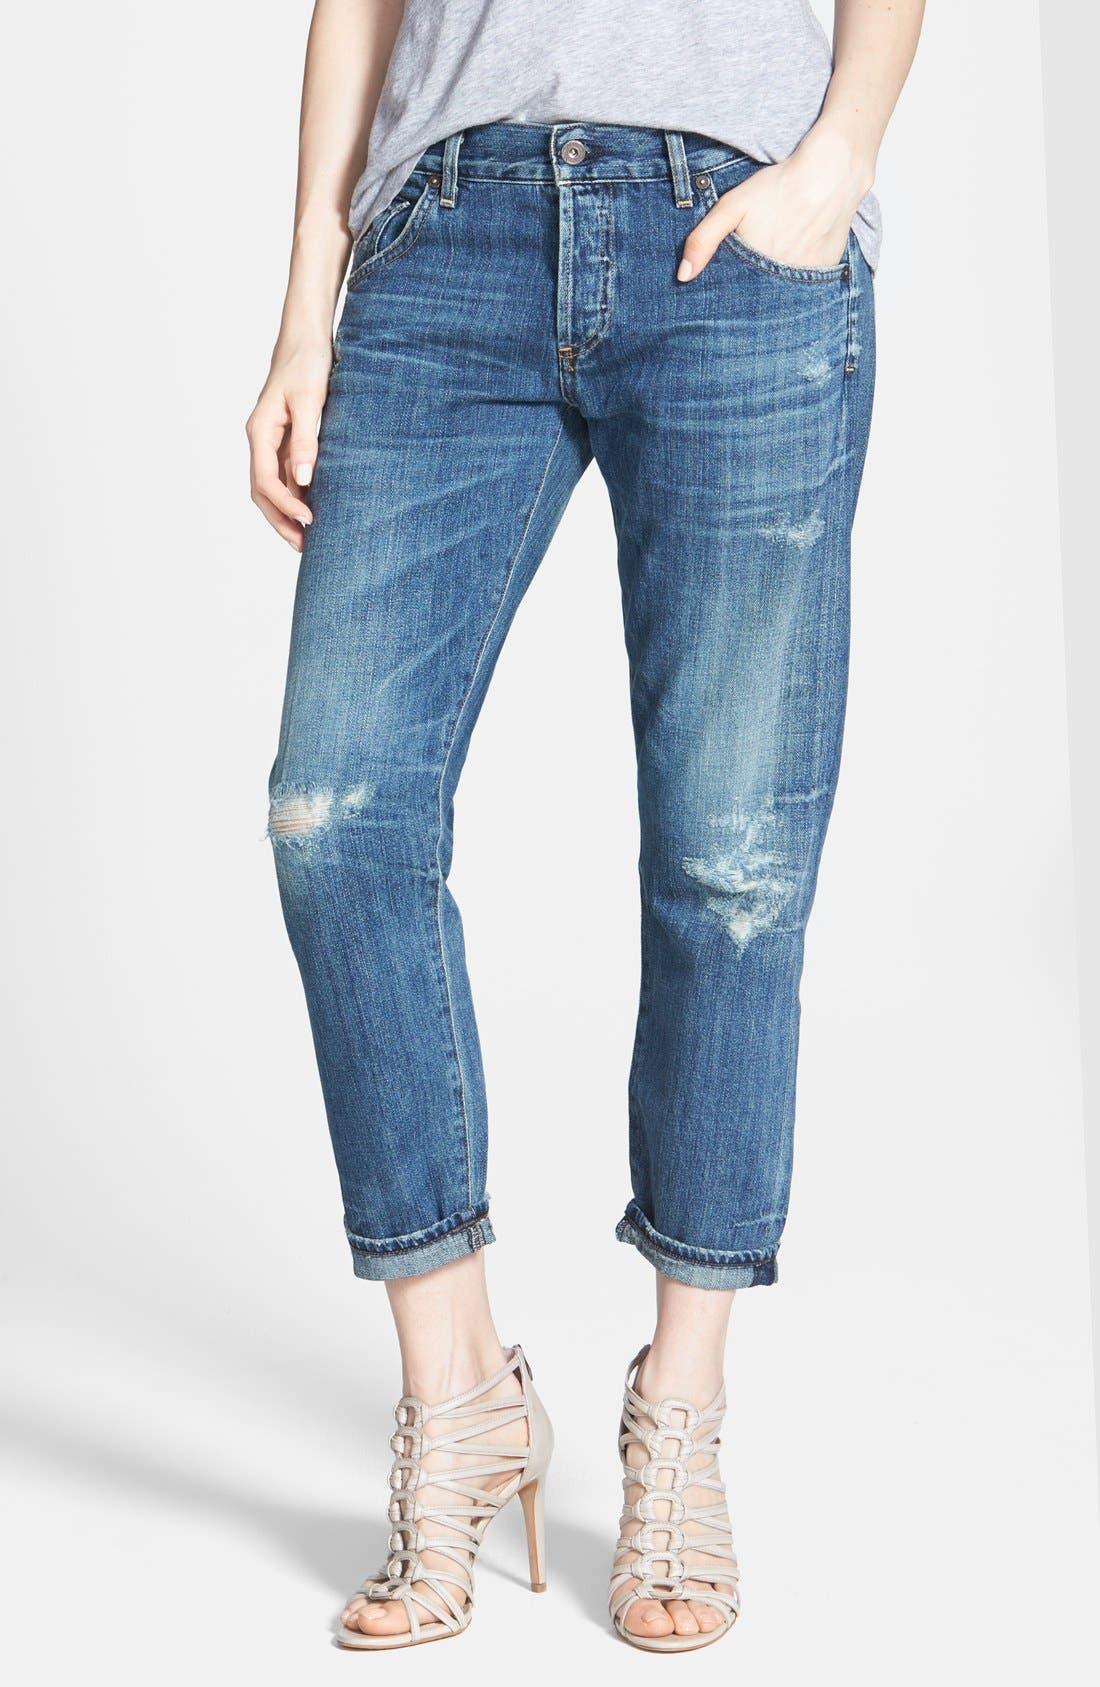 Main Image - Citizens of Humanity 'Premium Vintage - Skyler' Distressed Crop Jeans (Legacy)